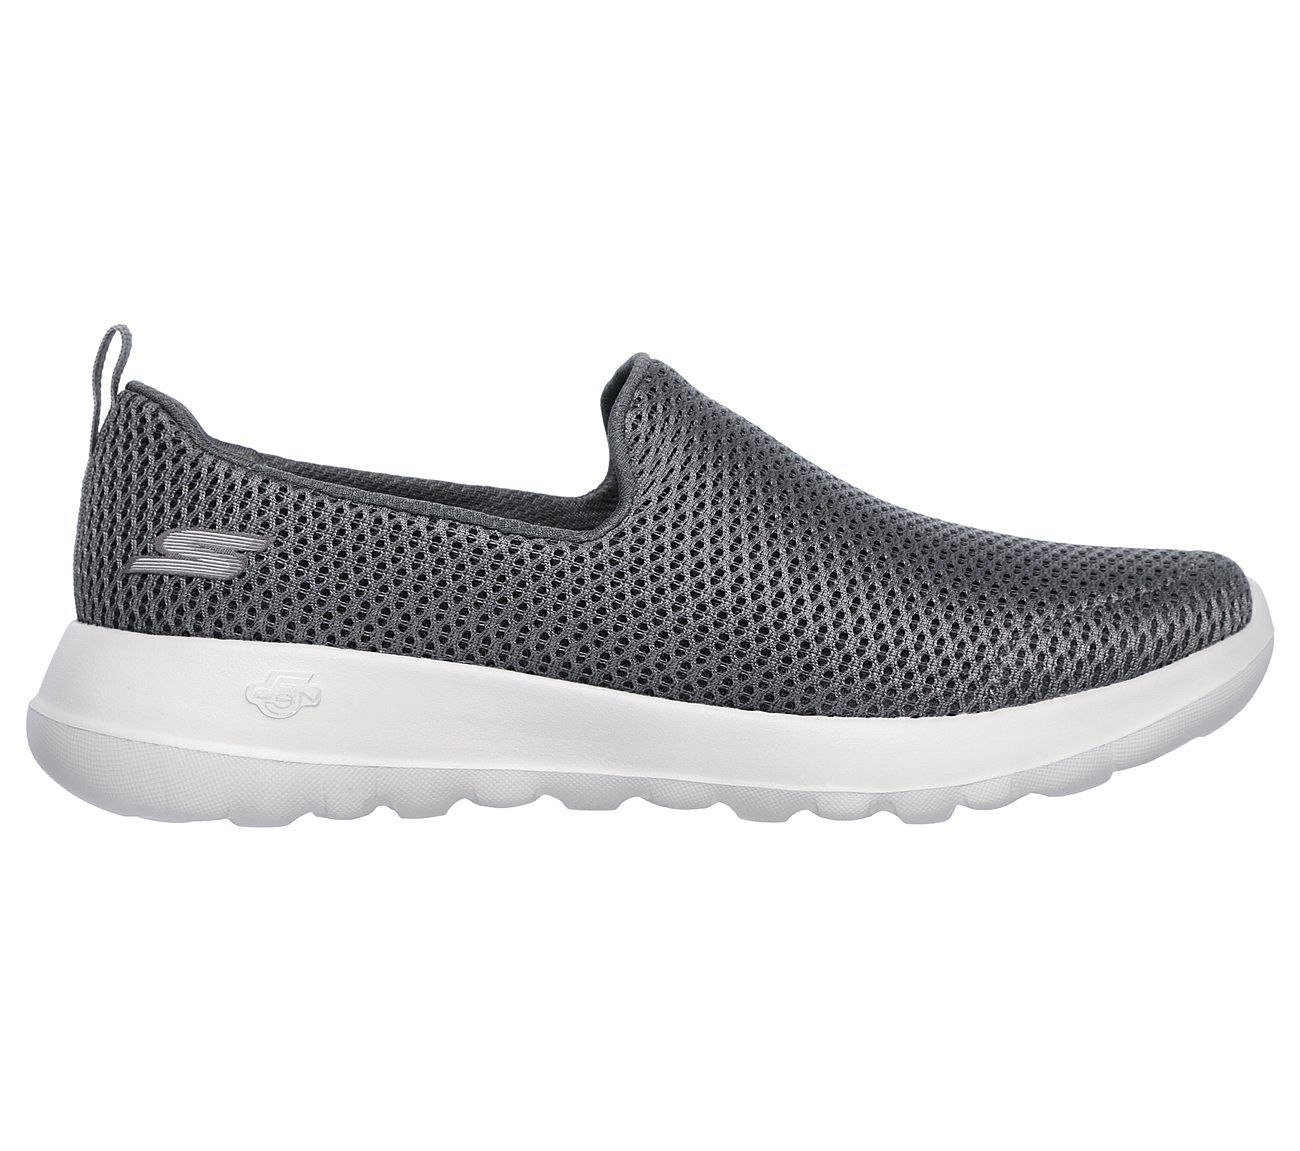 Best Women S Shoes For Plantar Fasciitis 2020 Women Shoes